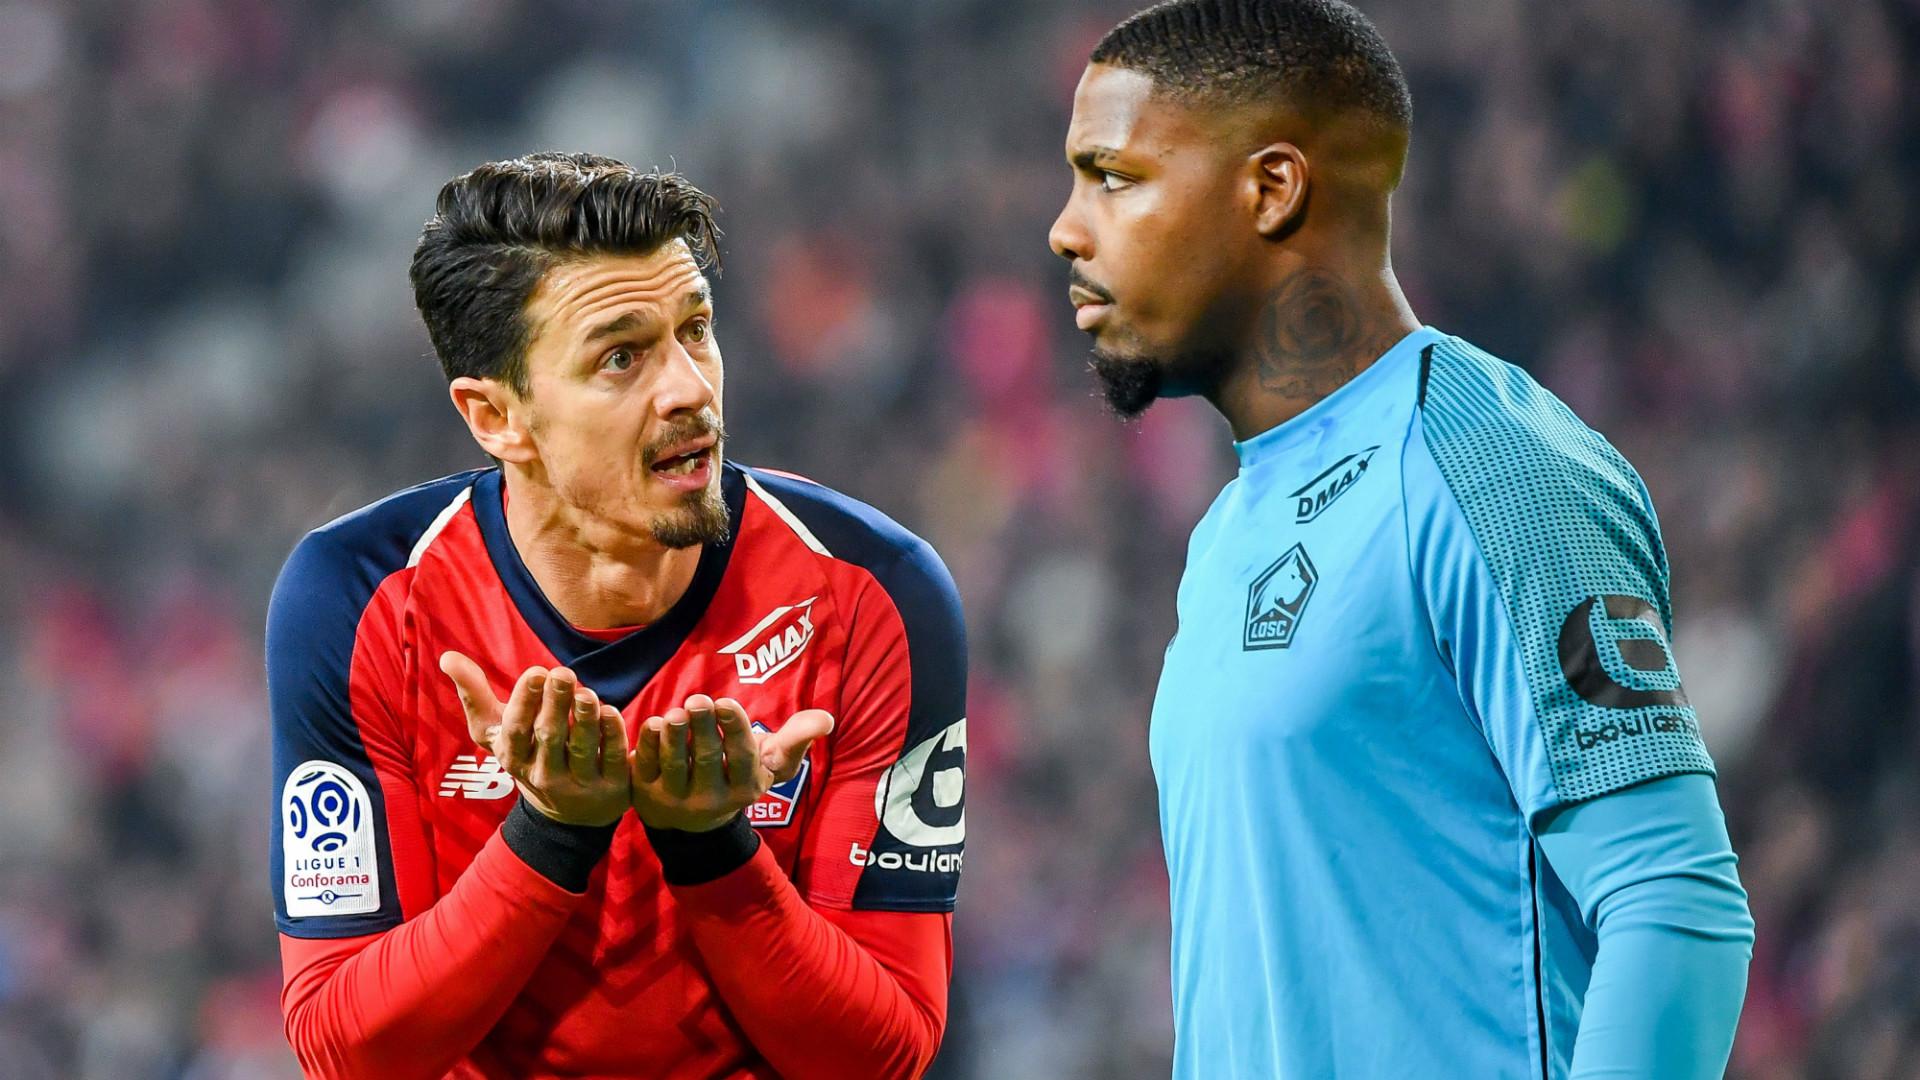 French Connection: โชเซ ฟอนเต้ กุญแจสำคัญสู่การเค้นฟอร์มดาวรุ่งลีลล์ |  Goal.com